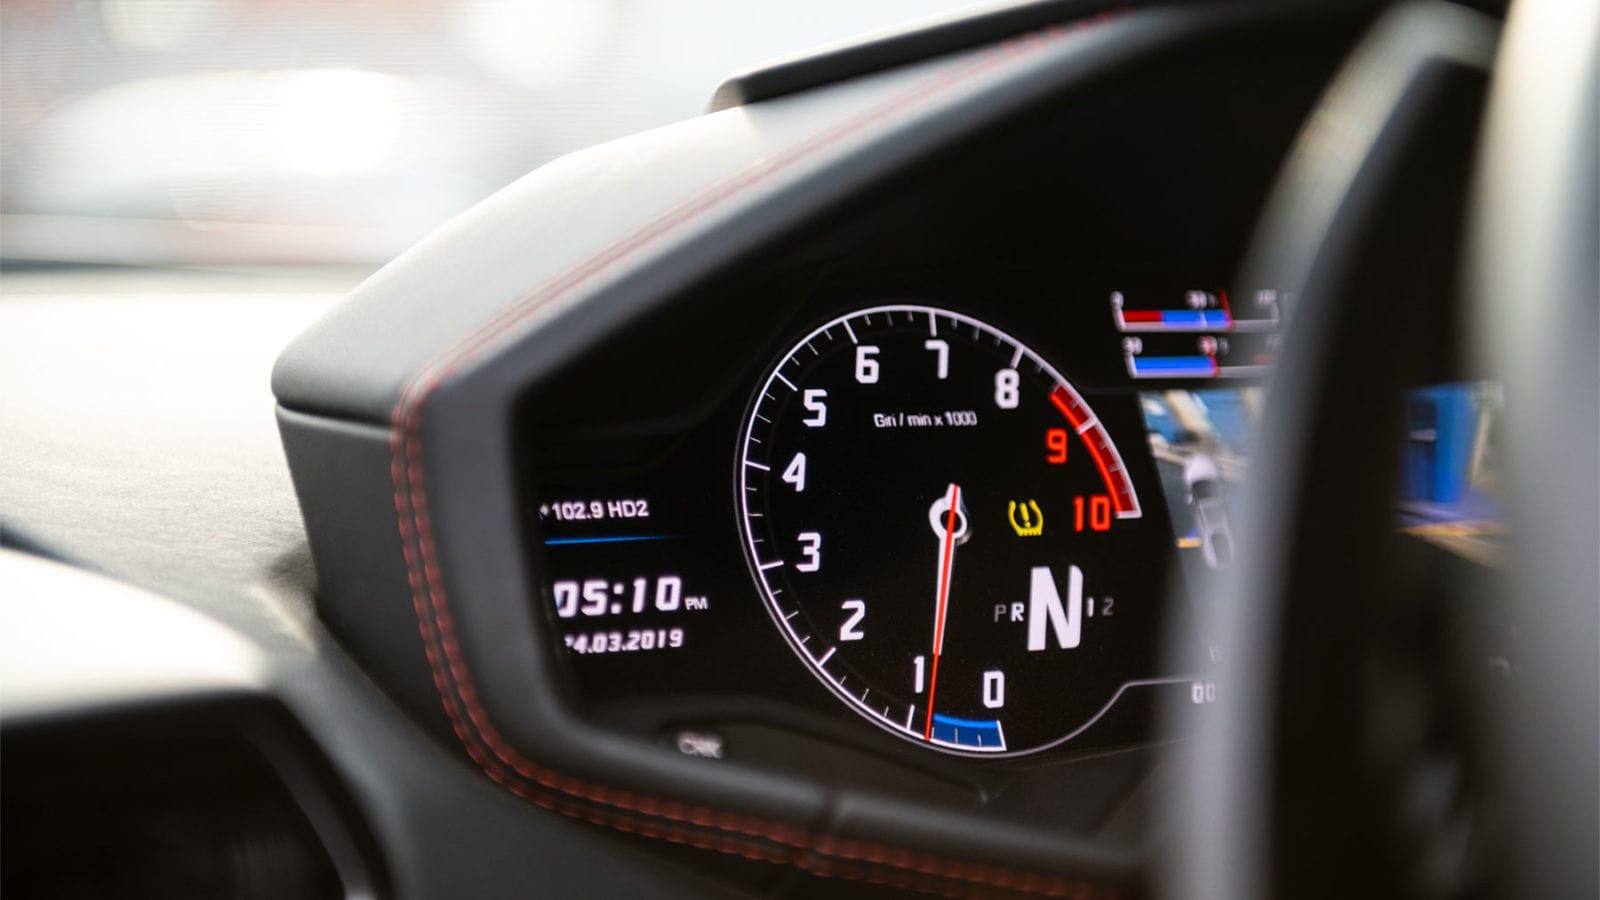 Lamborghini Huracan tachometer